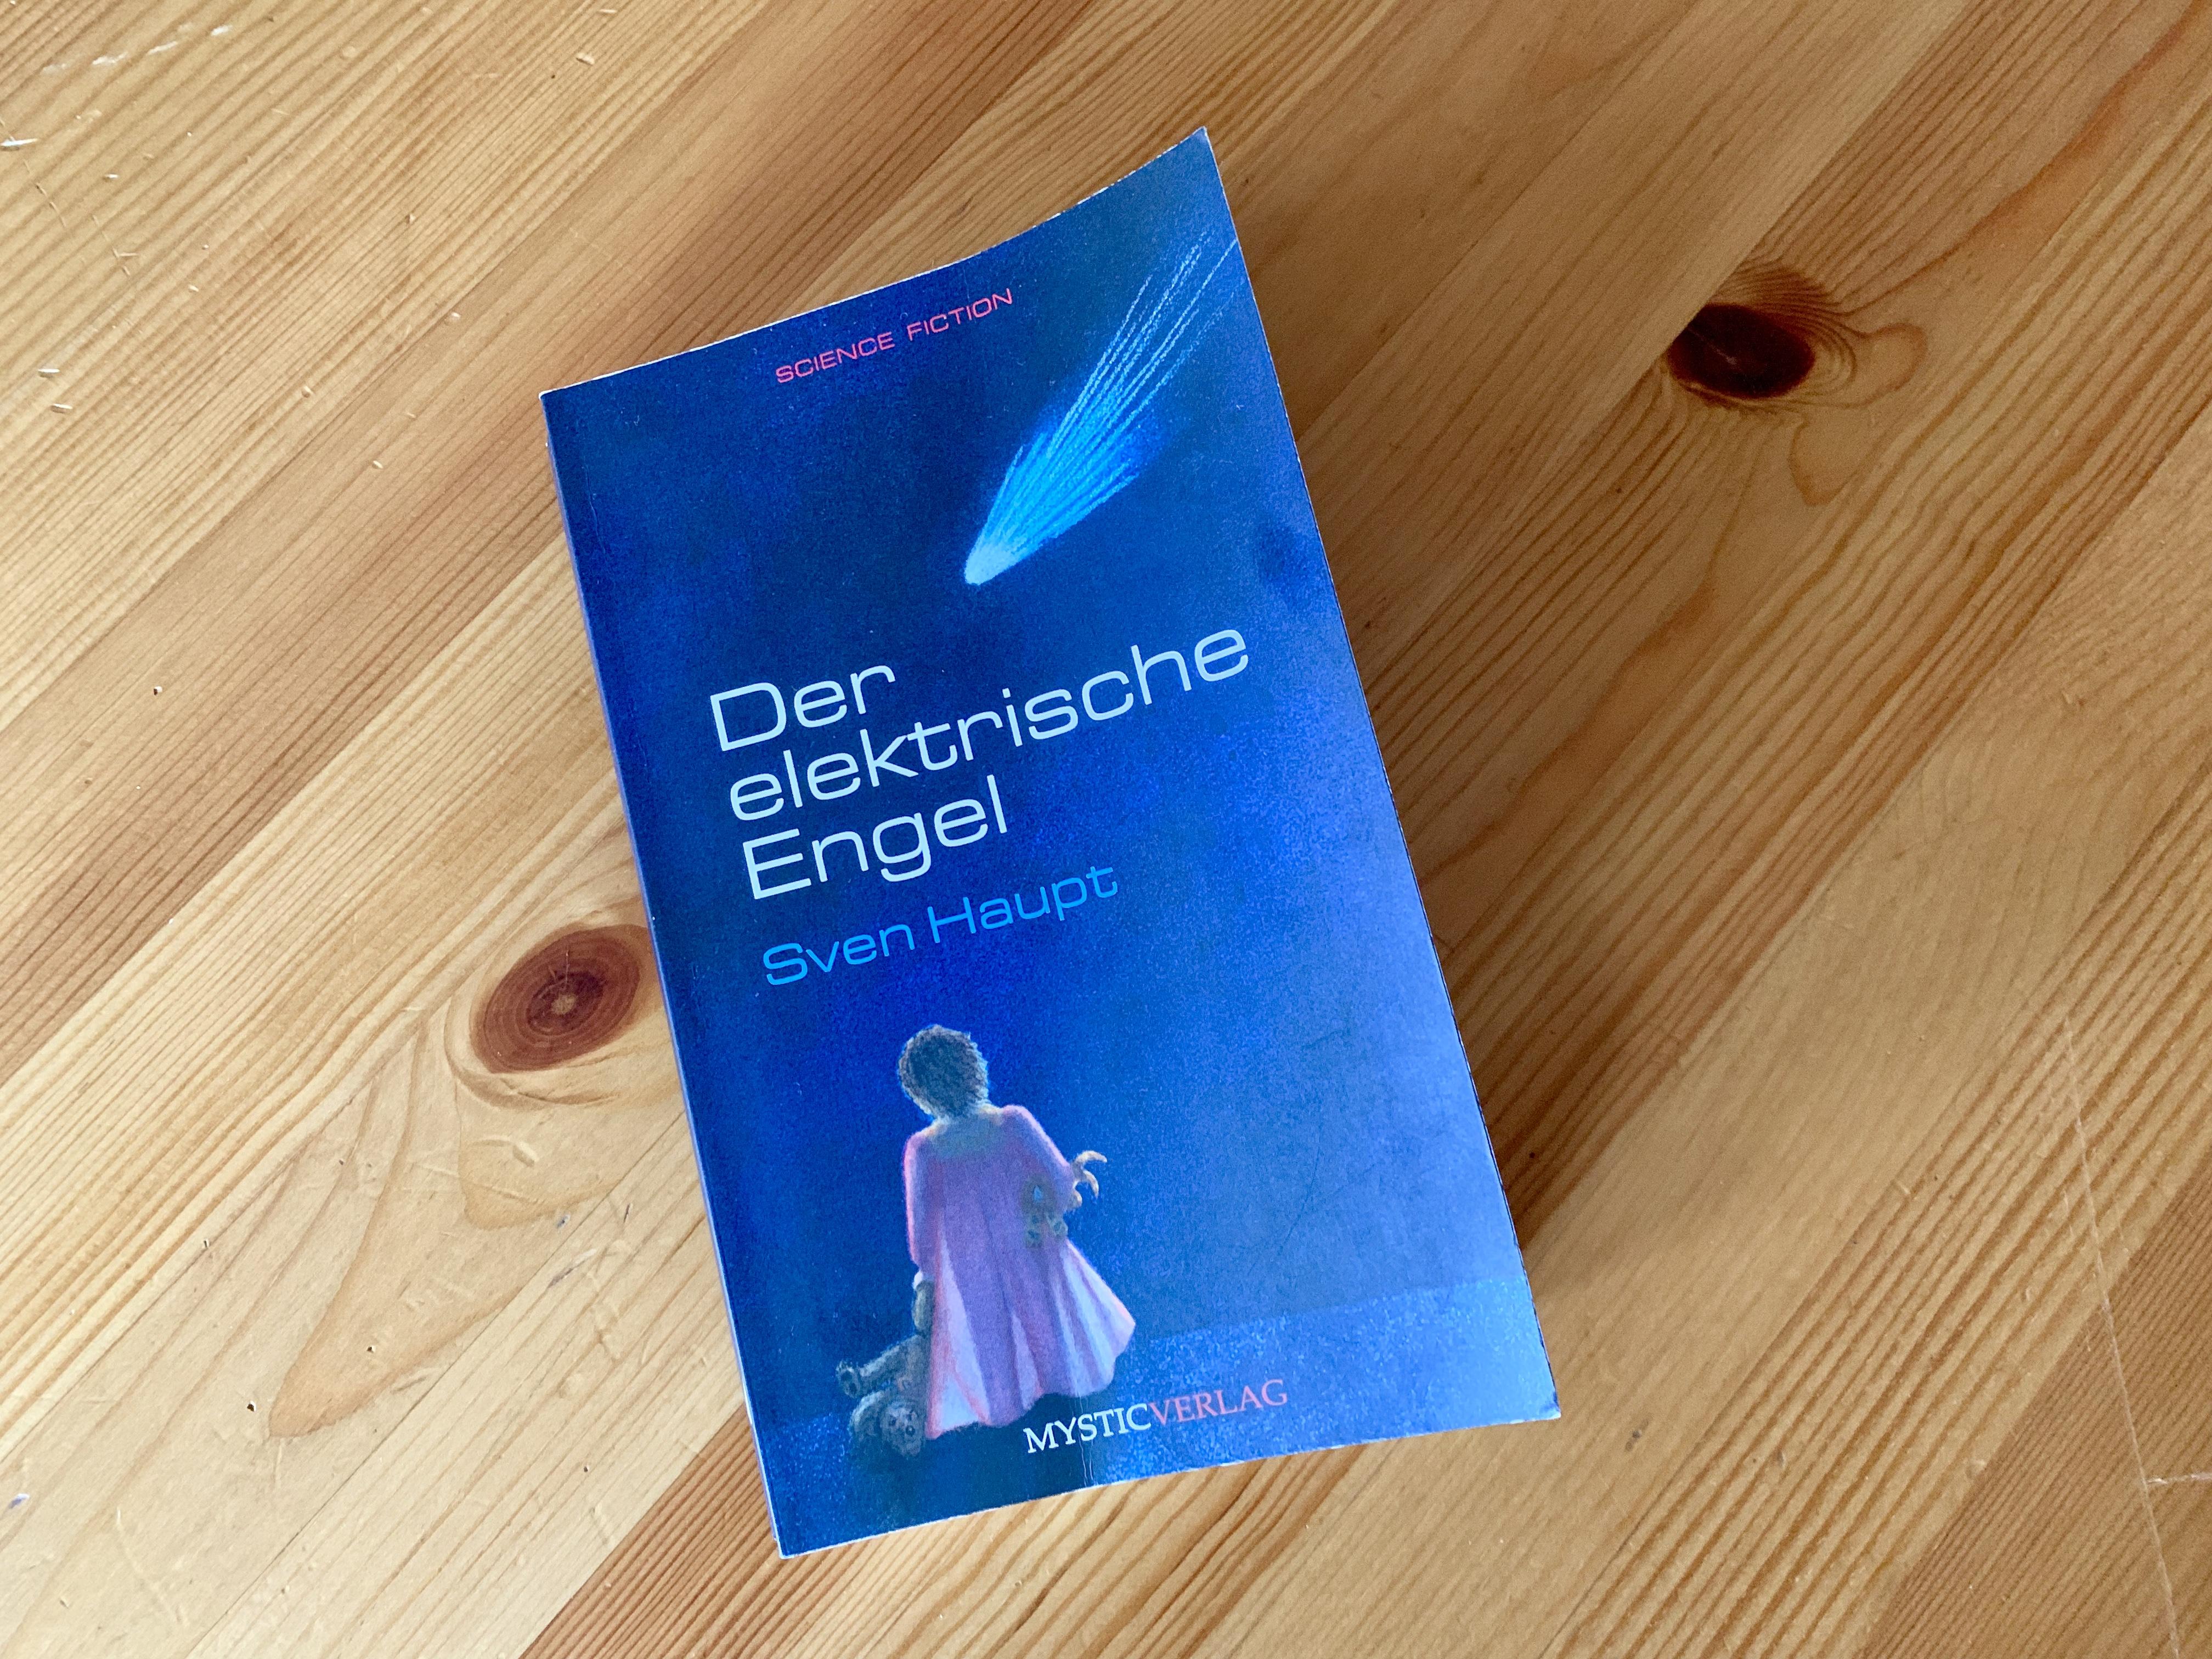 Der elektrische Engel - Sven Haupt - Buchcover - Gestaltung: Claudia Gornik [Coverboost]/ Helga Sadowski